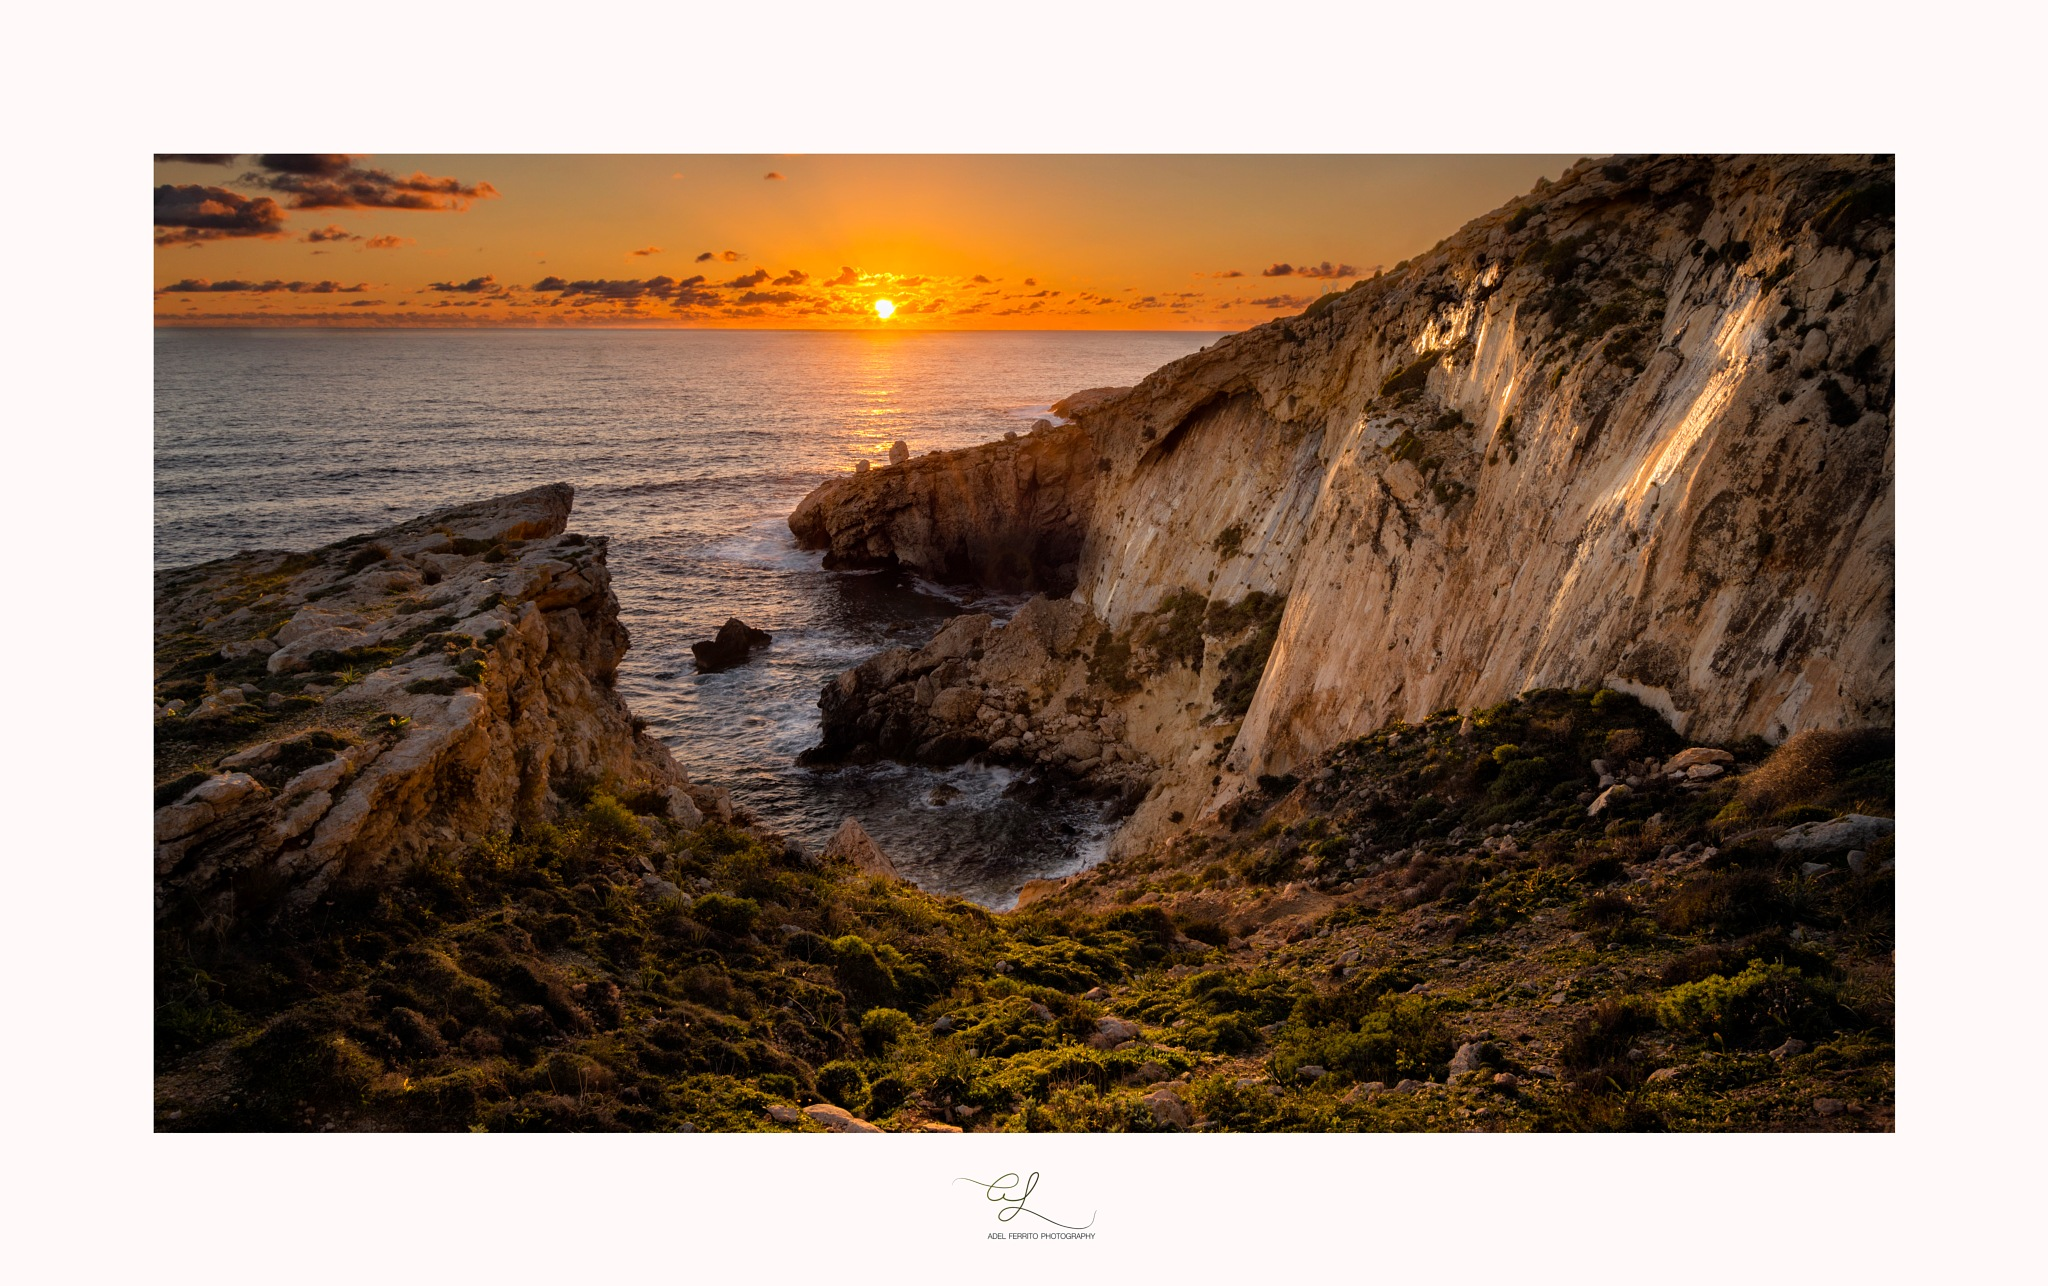 Winter's Sunset by adel ferrito